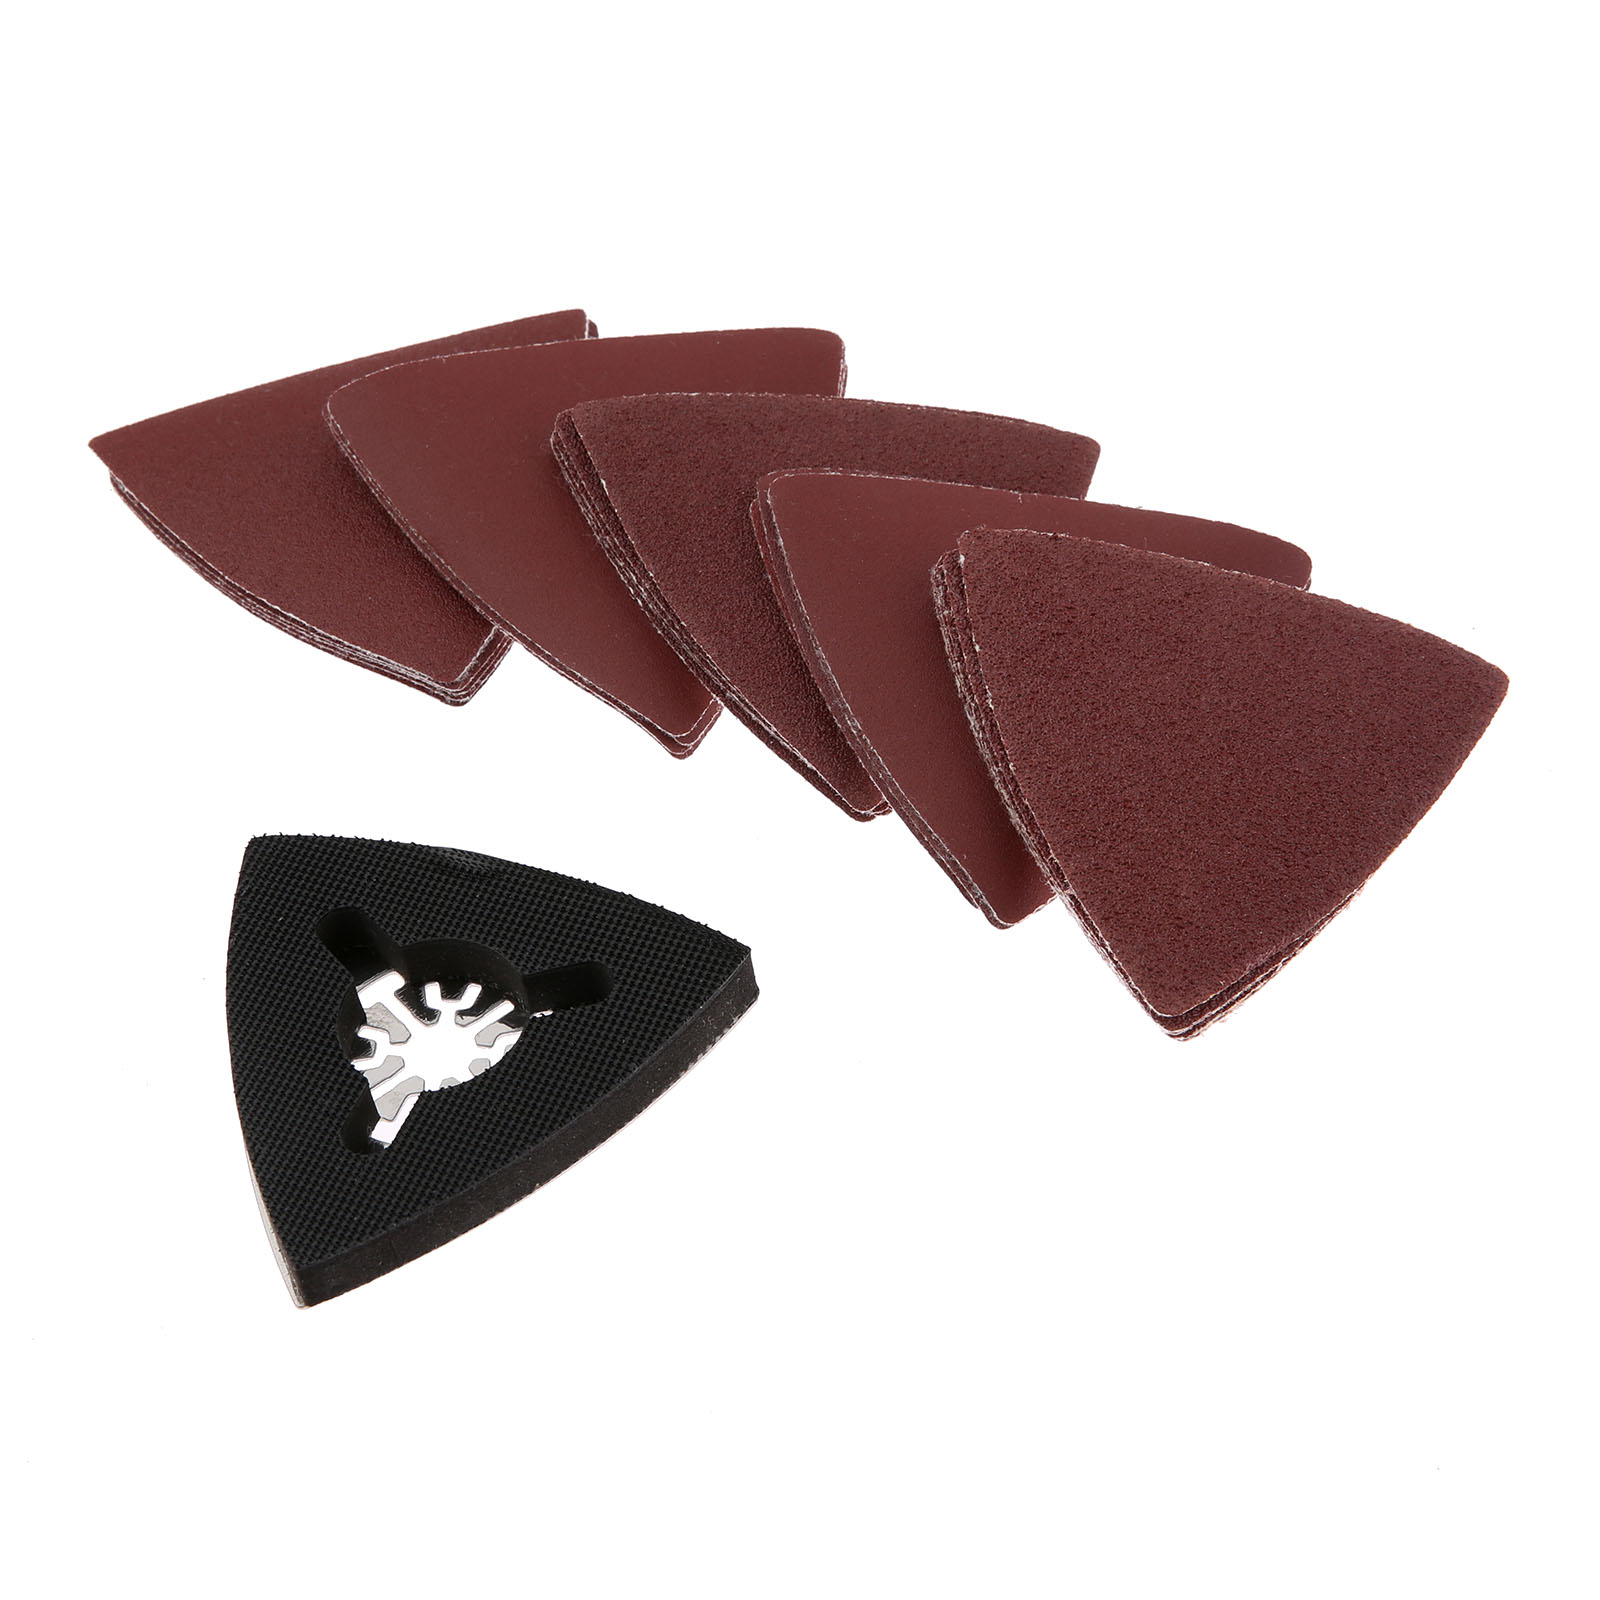 DRELD 25Pcs 83mm Sanding Paper +1Pc 80mm Triangular Sanding Pad Fits For Fein Dremel Multifunction Oscillating Multi Tools